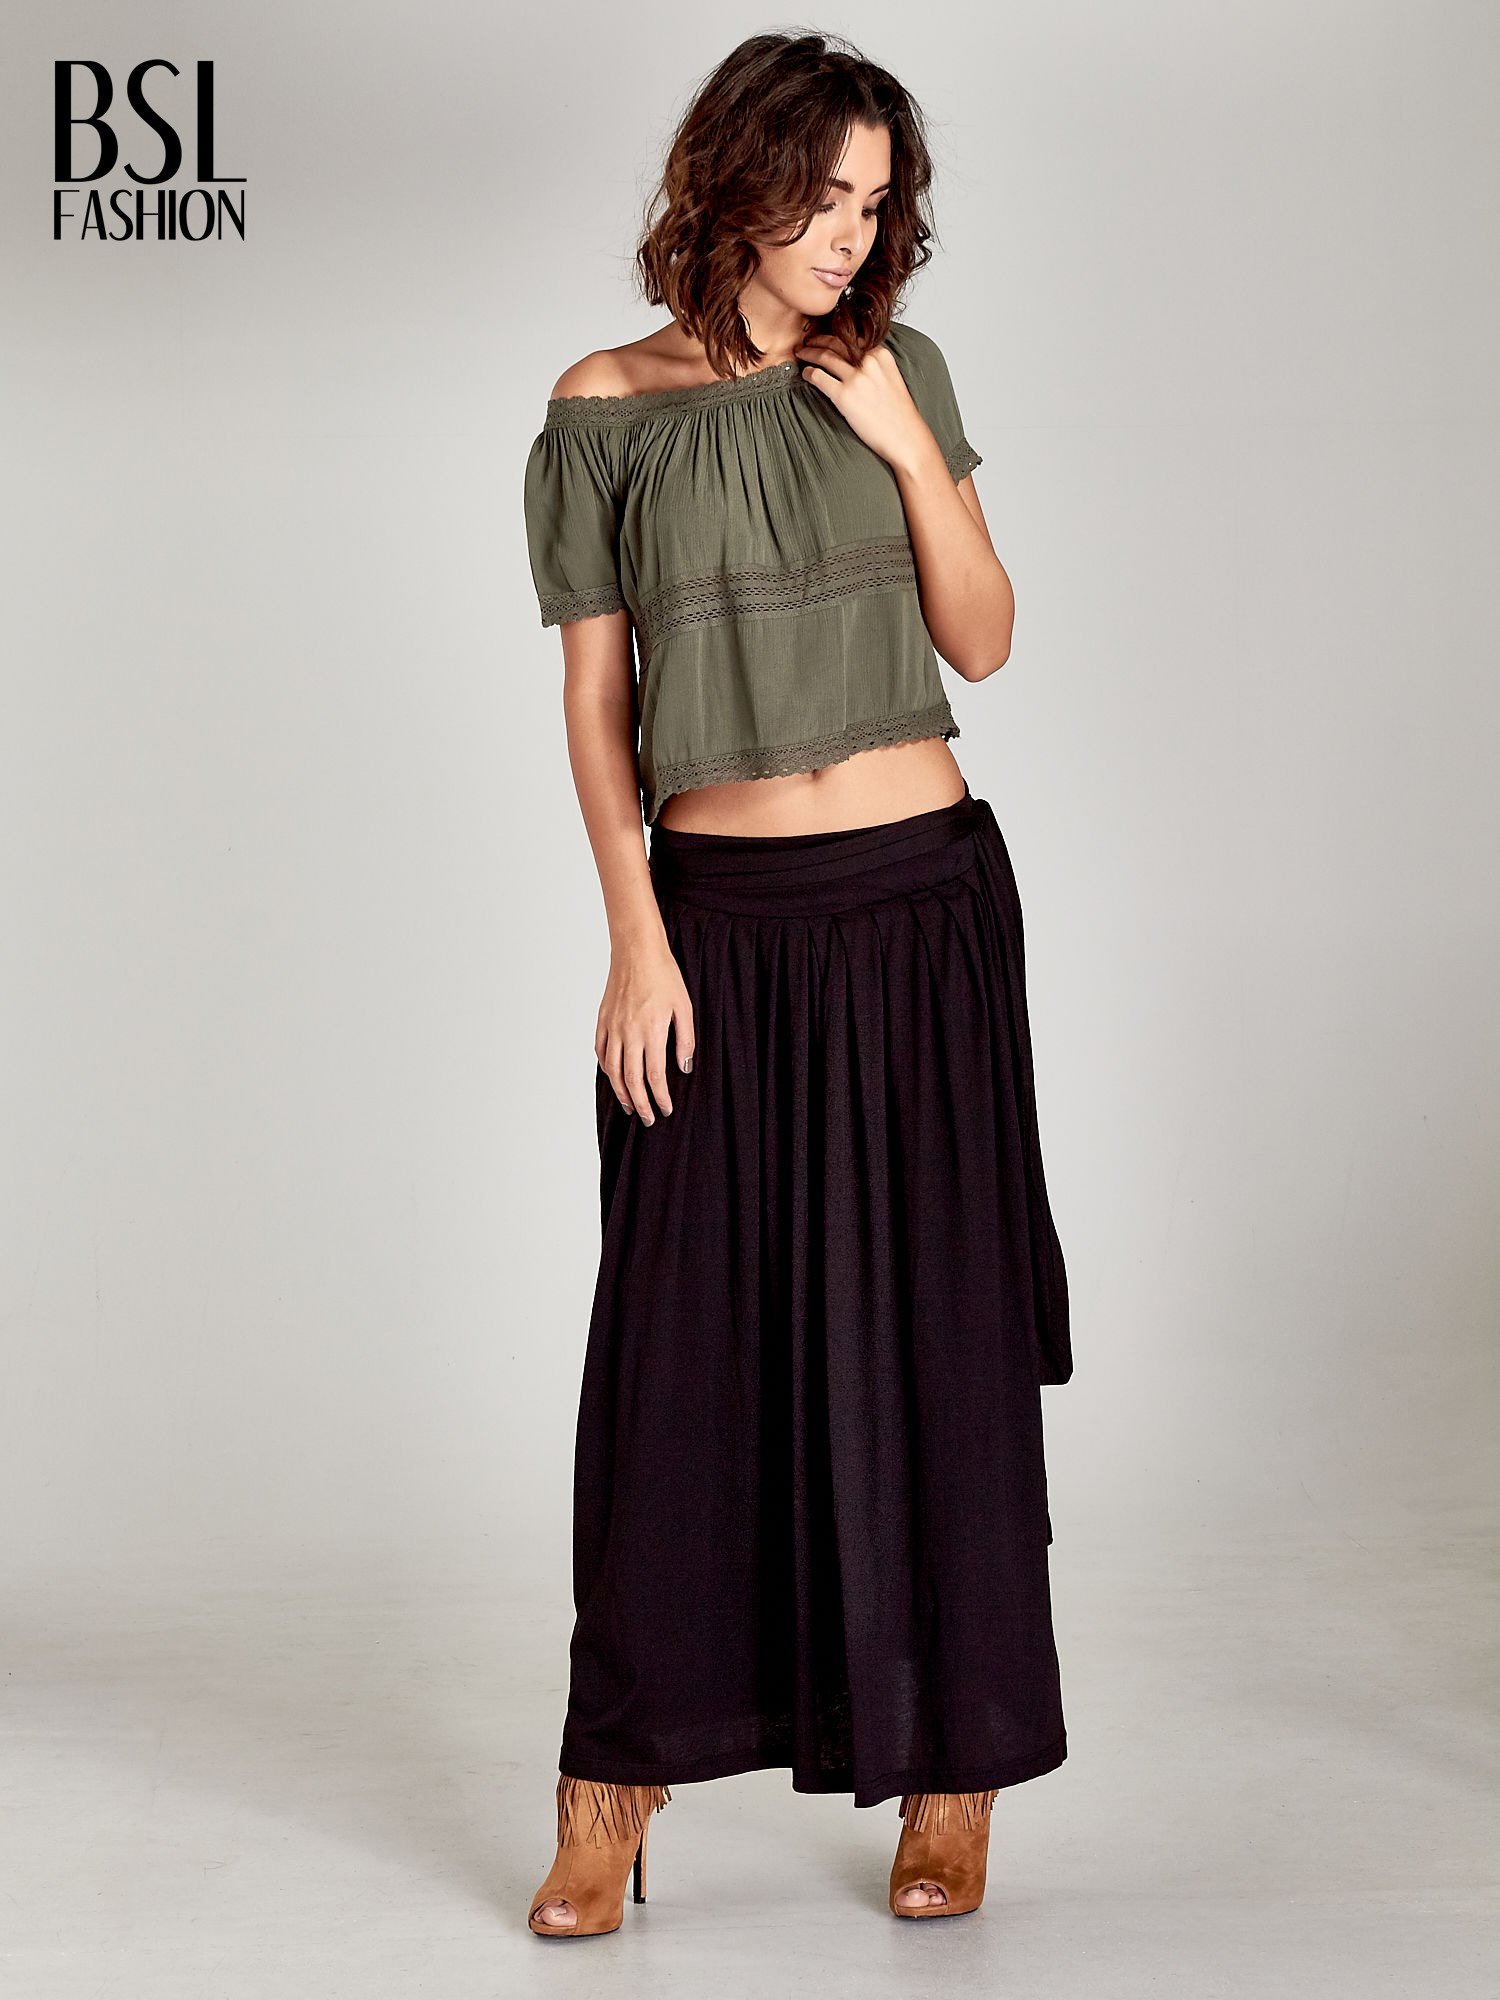 Czarna plisowana spódnica maxi                                  zdj.                                  2